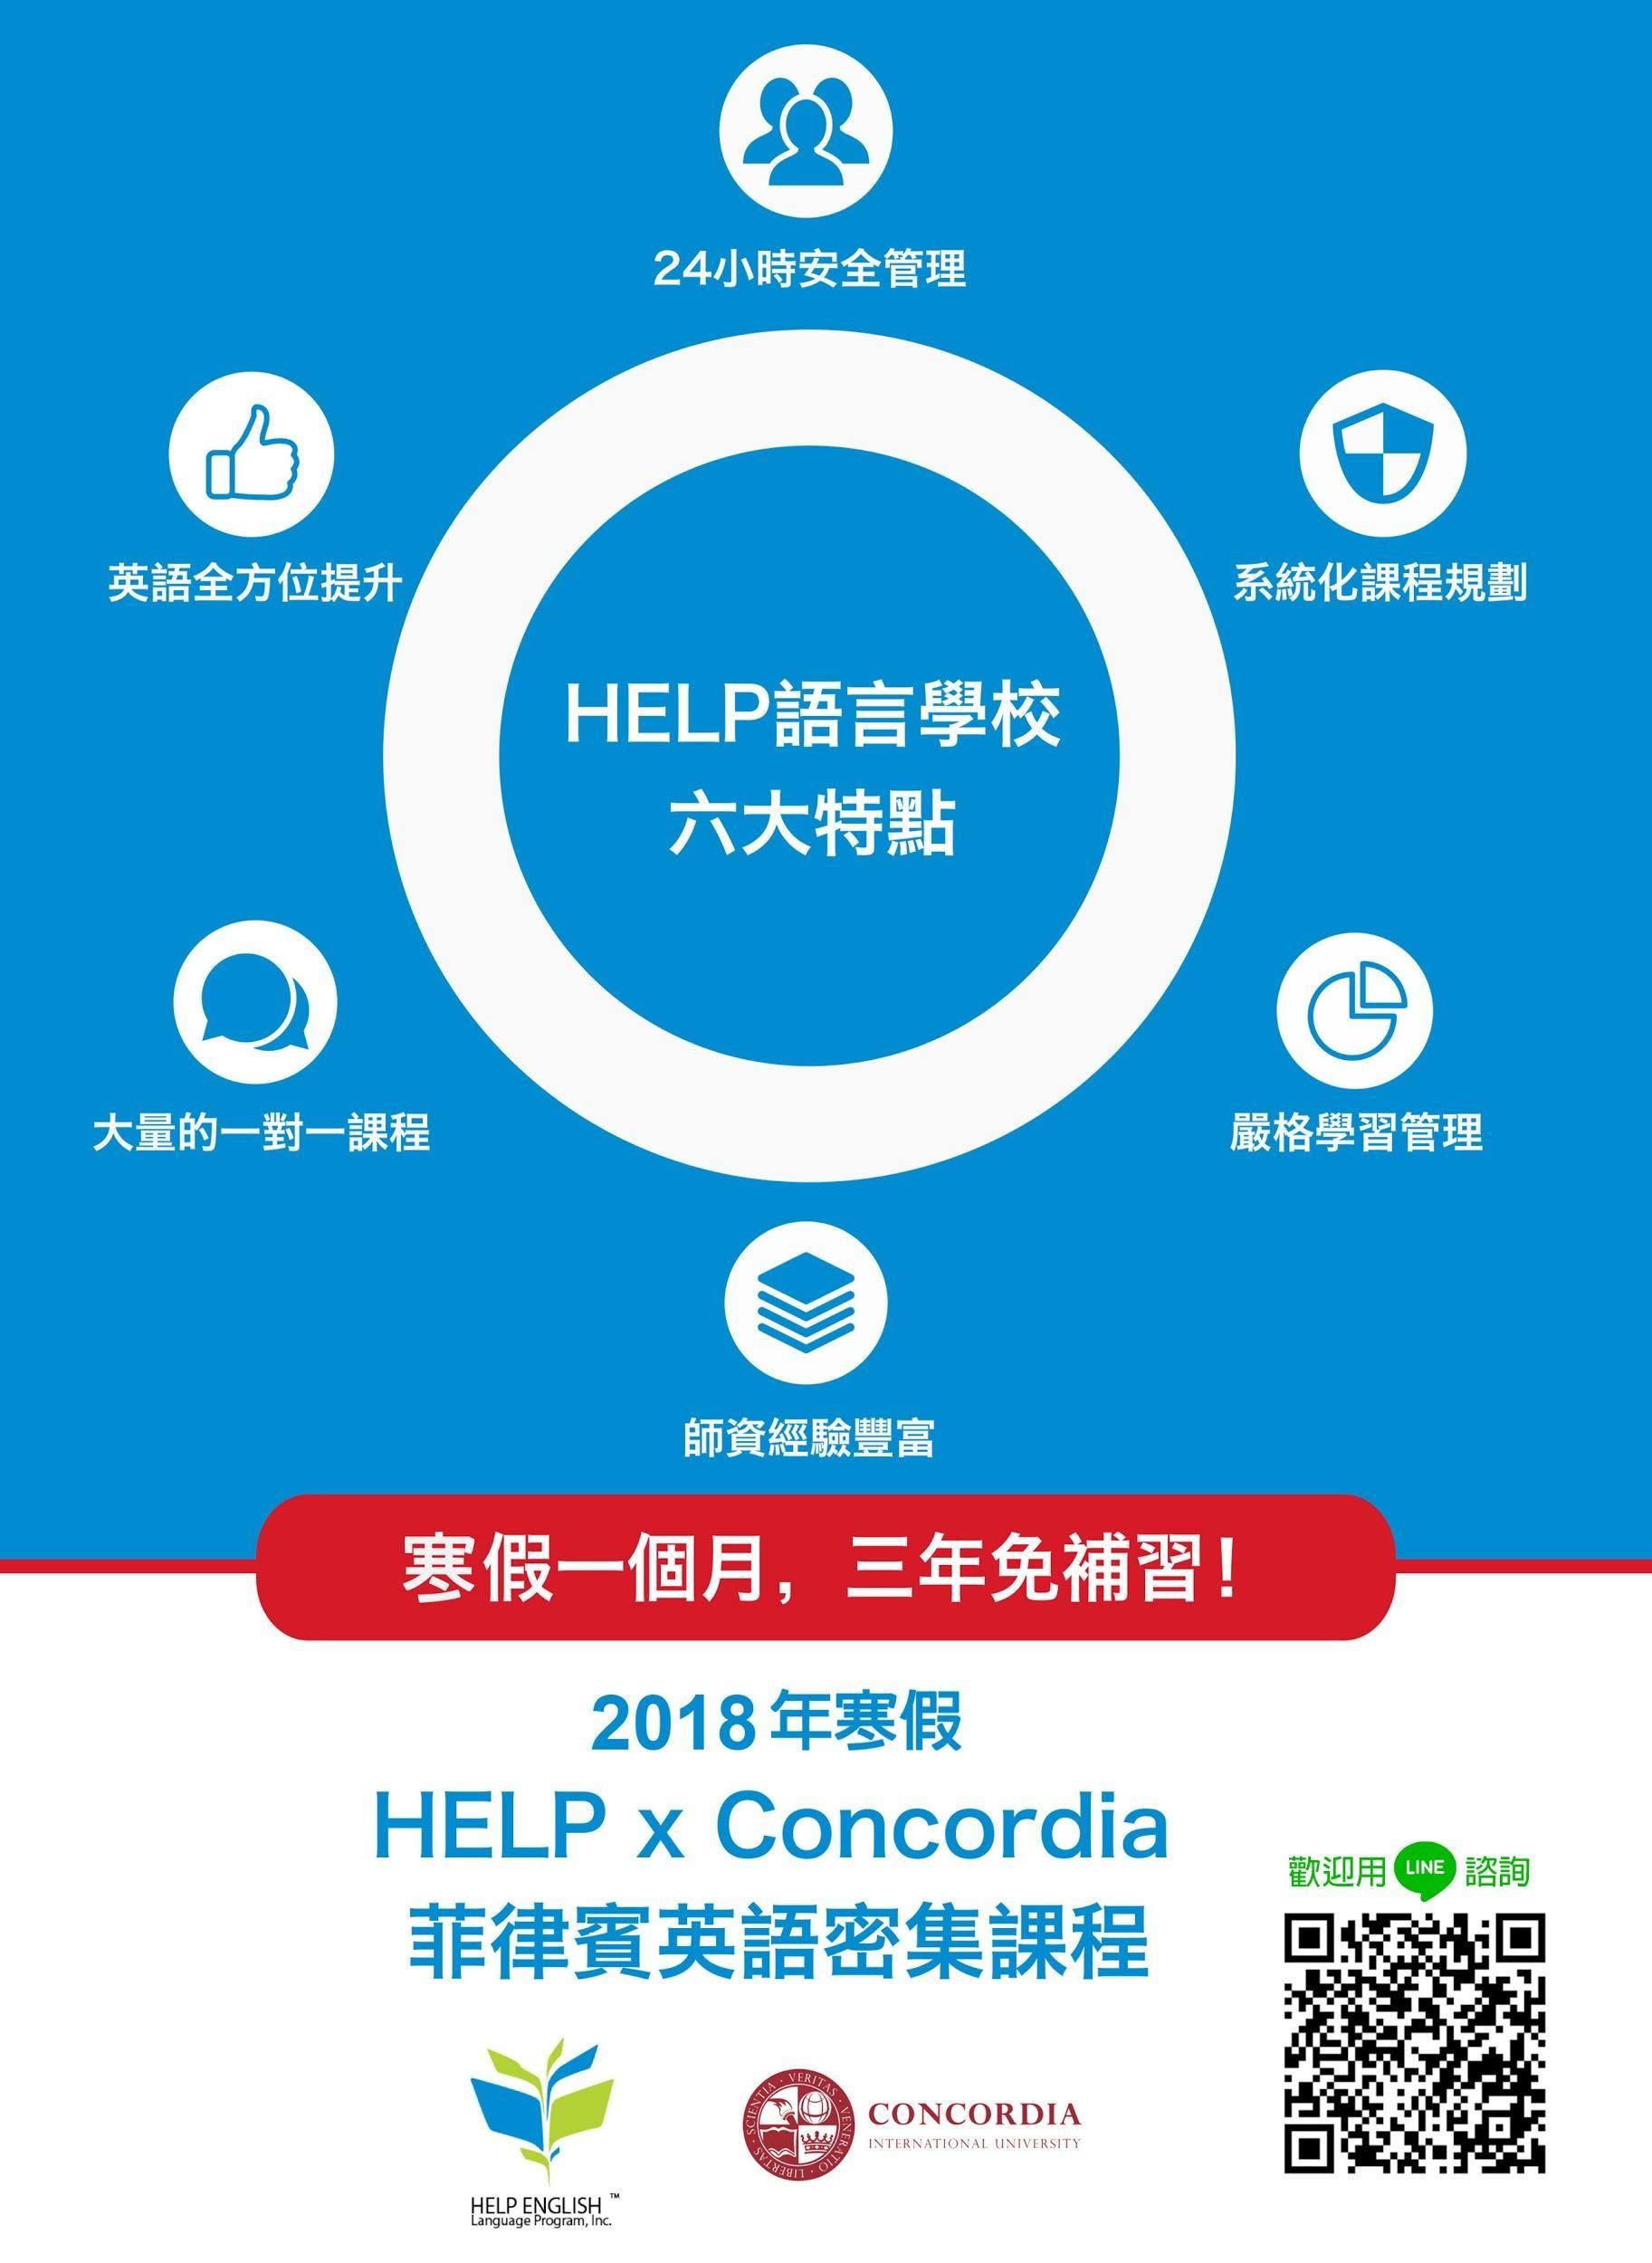 HELPx Concorida 2018寒假密集英語專班菲律賓遊學